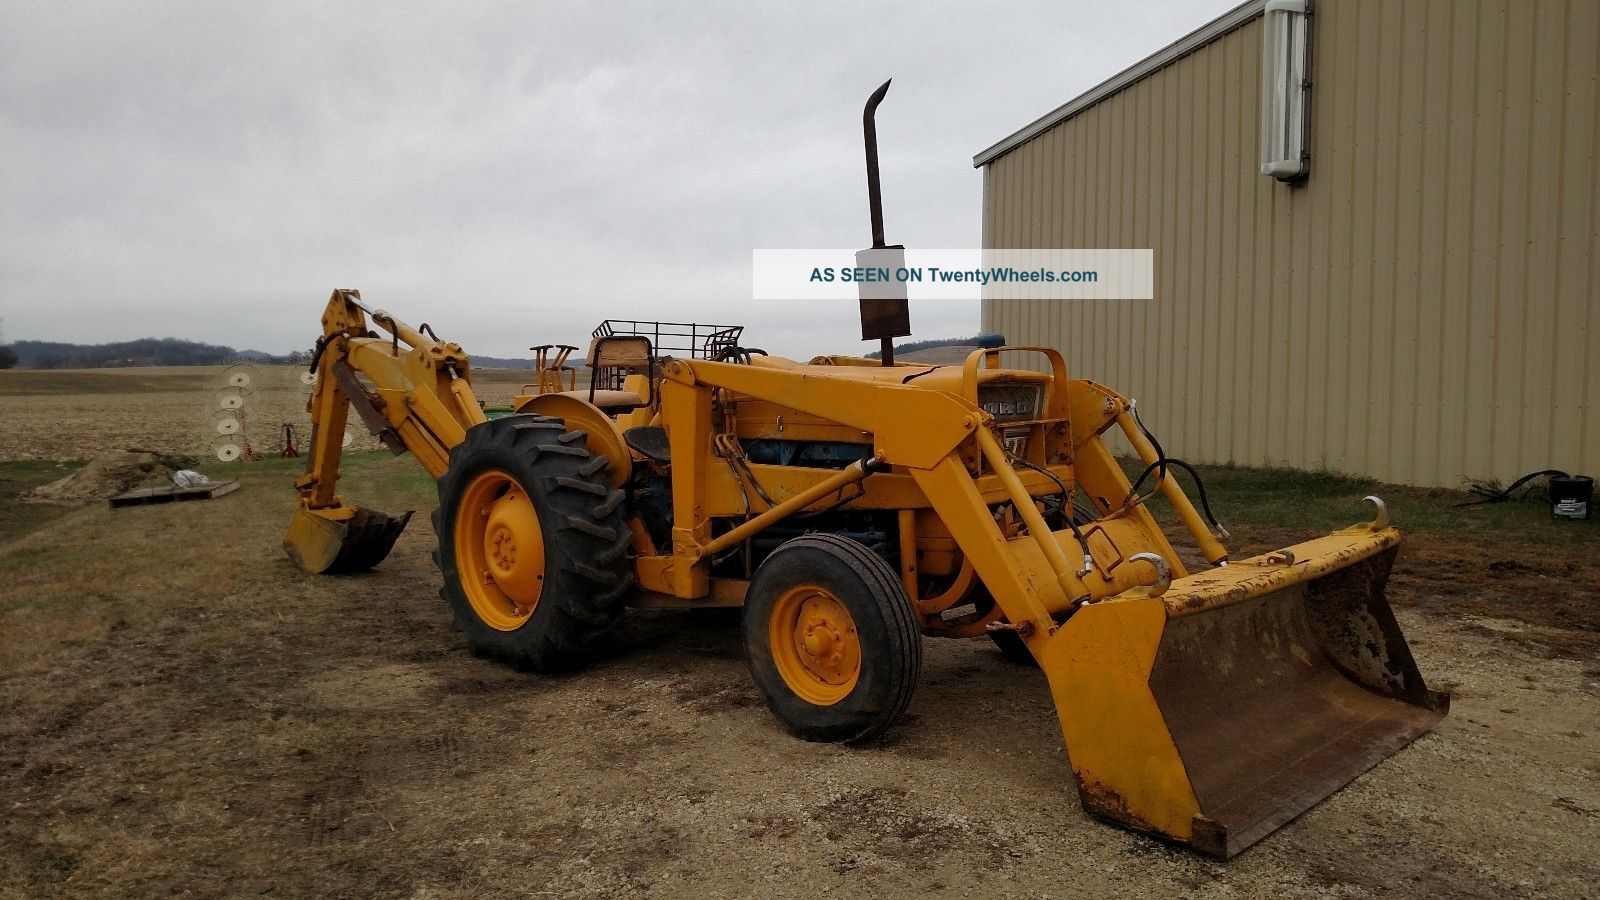 Ford 4500 Industrial Tractor Backhoe : Ford loader backhoe tractor